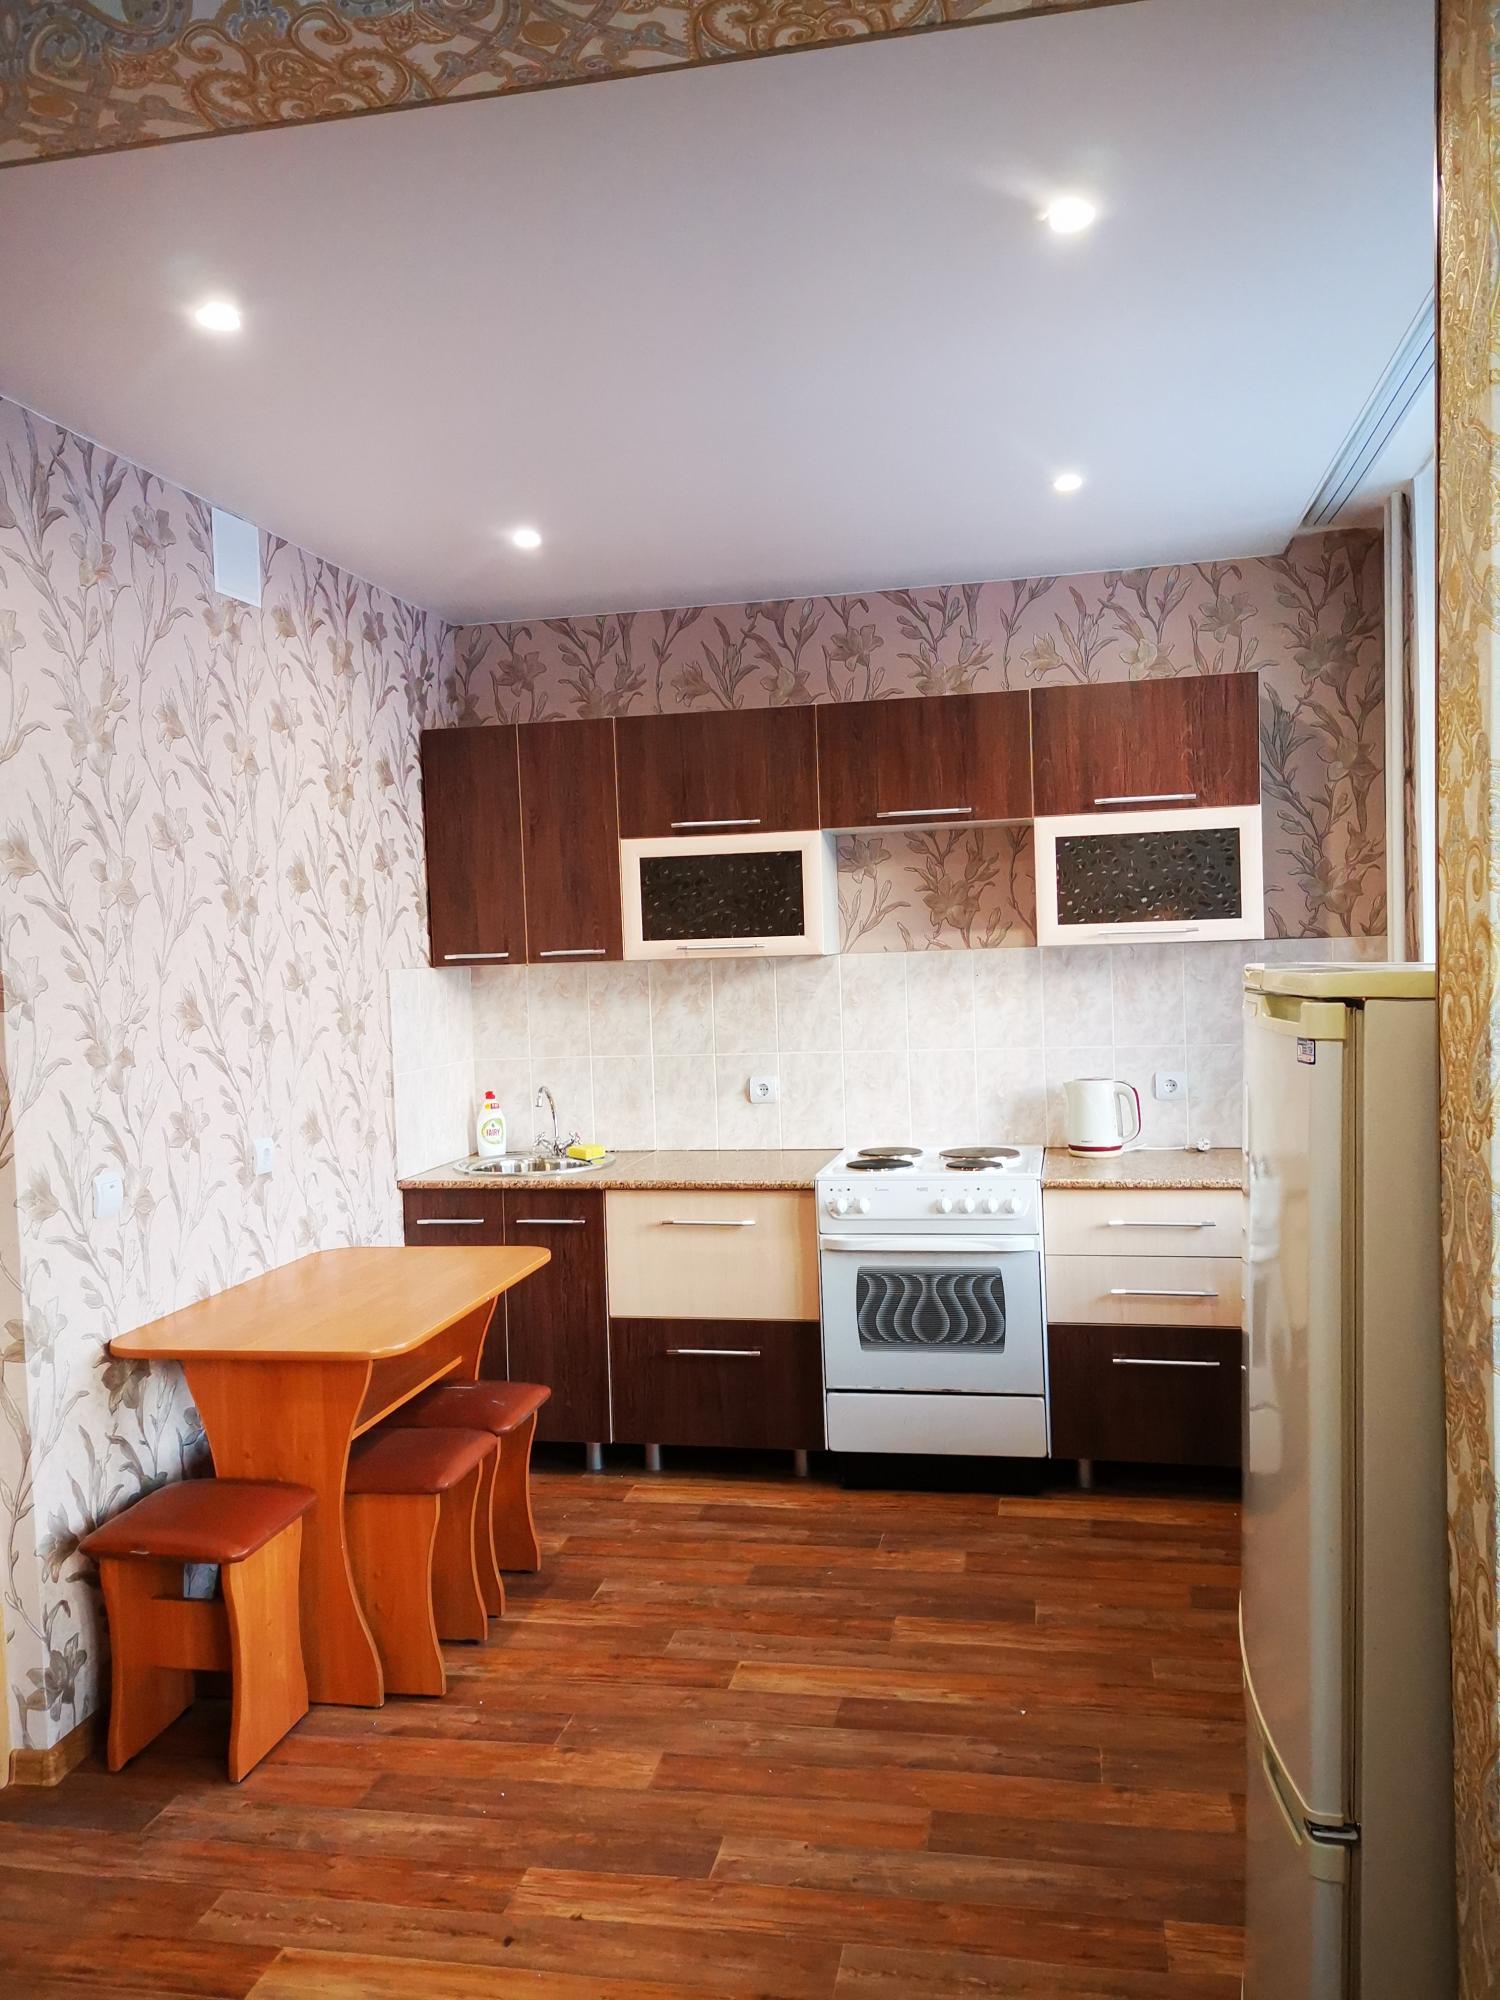 1к квартира Ястынское поле, улица Мате Залки, 37 | 16000 | аренда в Красноярске фото 6